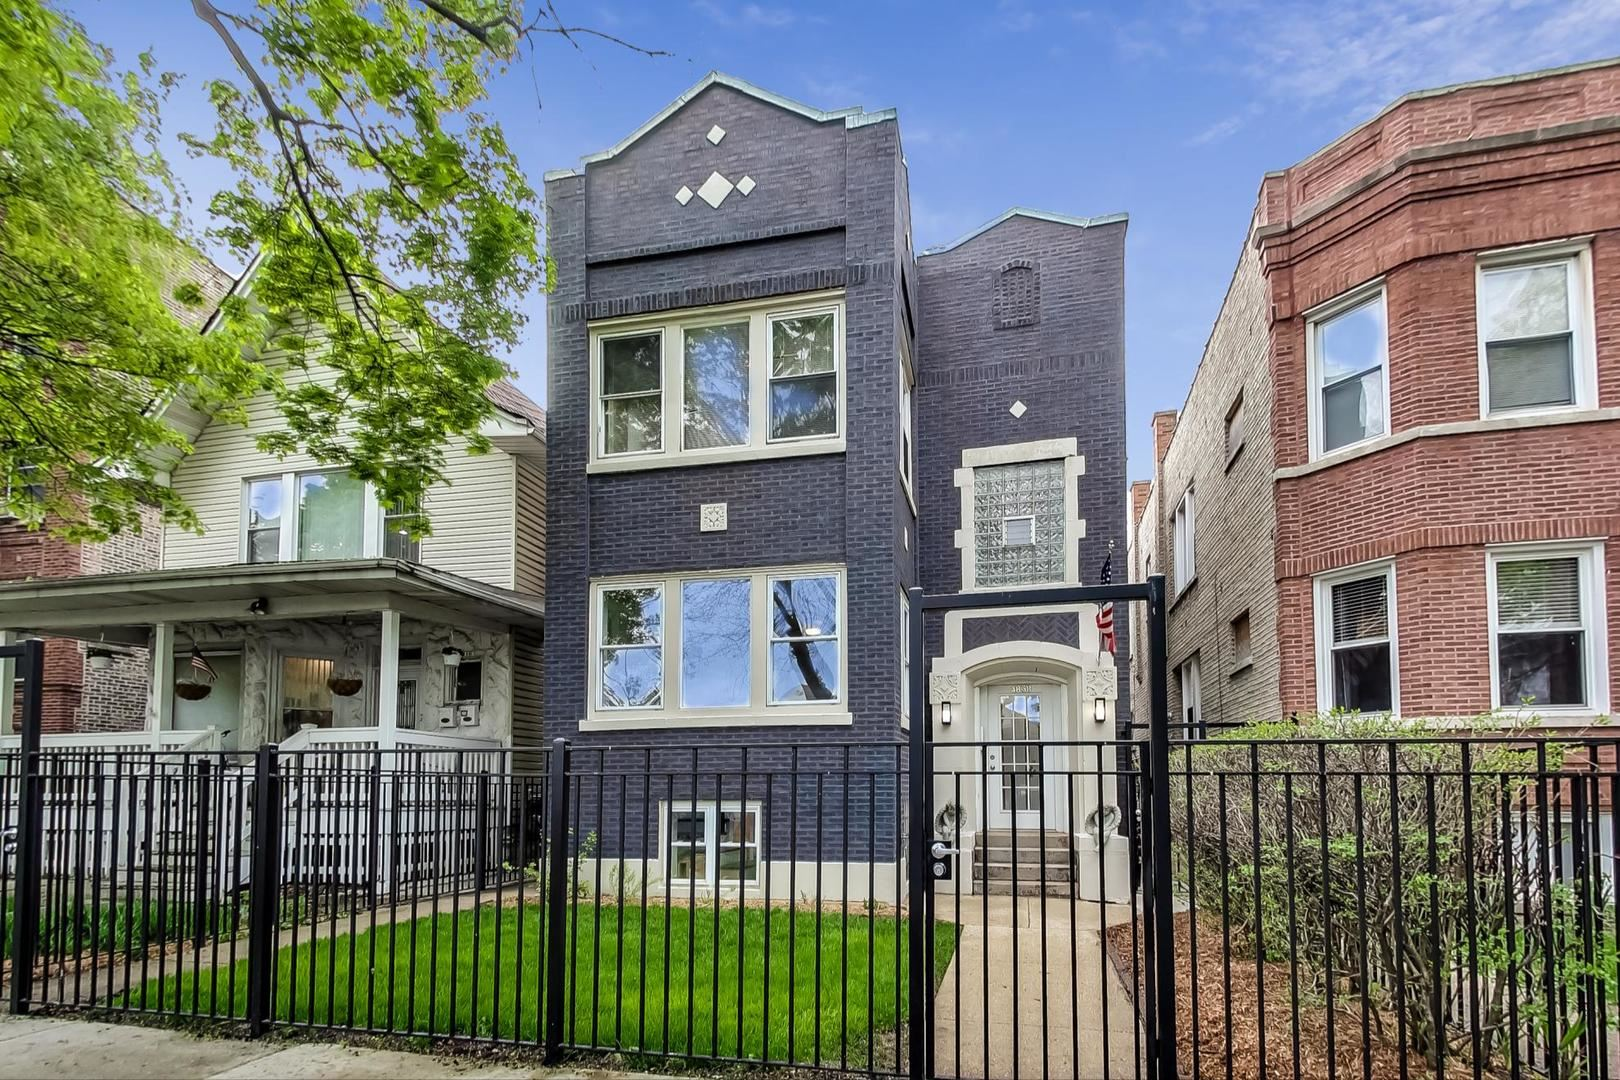 4838 N Spaulding Avenue, Chicago, IL 60625 - #: 10713973